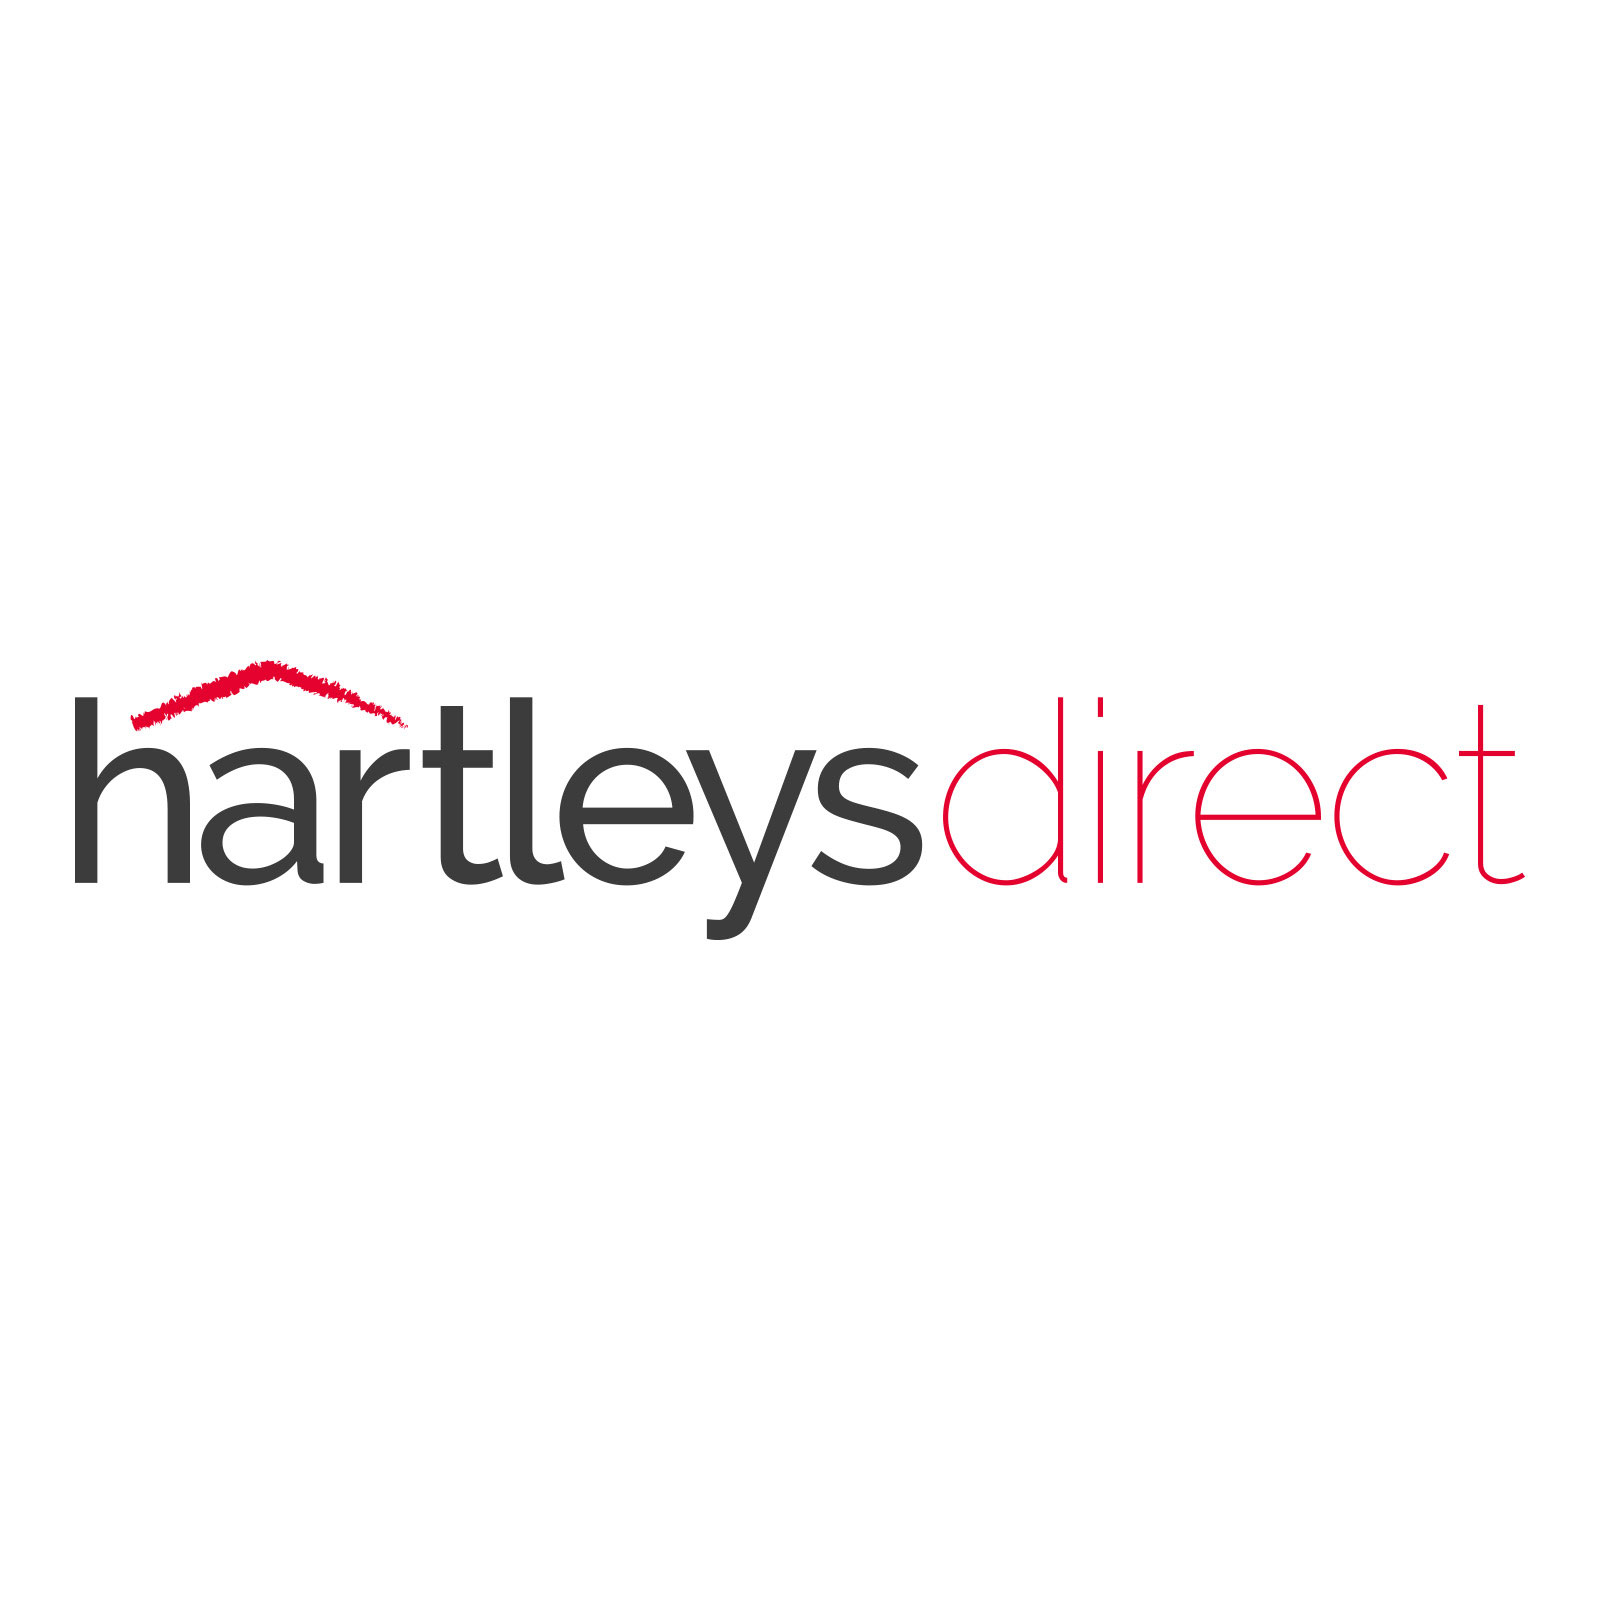 office chair parts b cool folding quad renovation hartleys direct chrome refurbishment kit